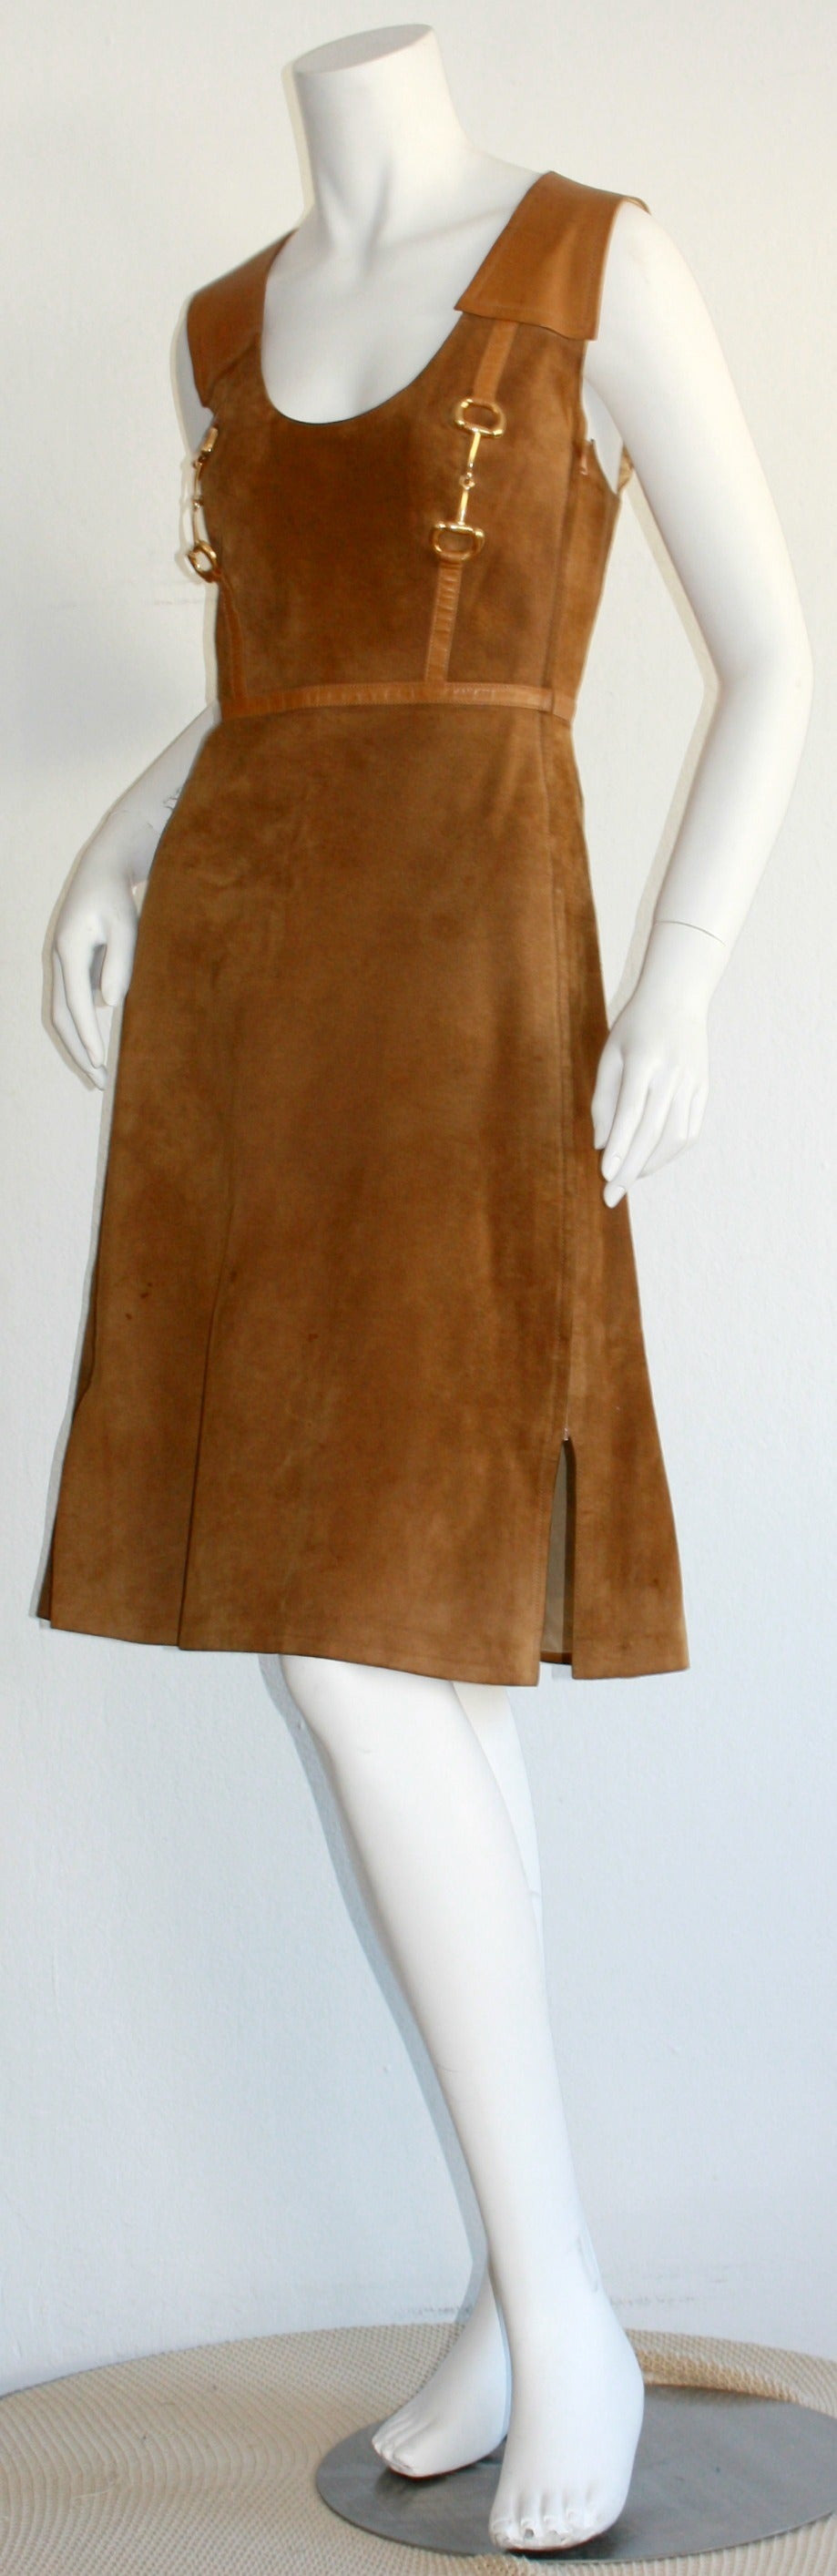 Rare Vintage 1960s Gucci Tan Leather Horsebit A - Line Space Age Dress 5